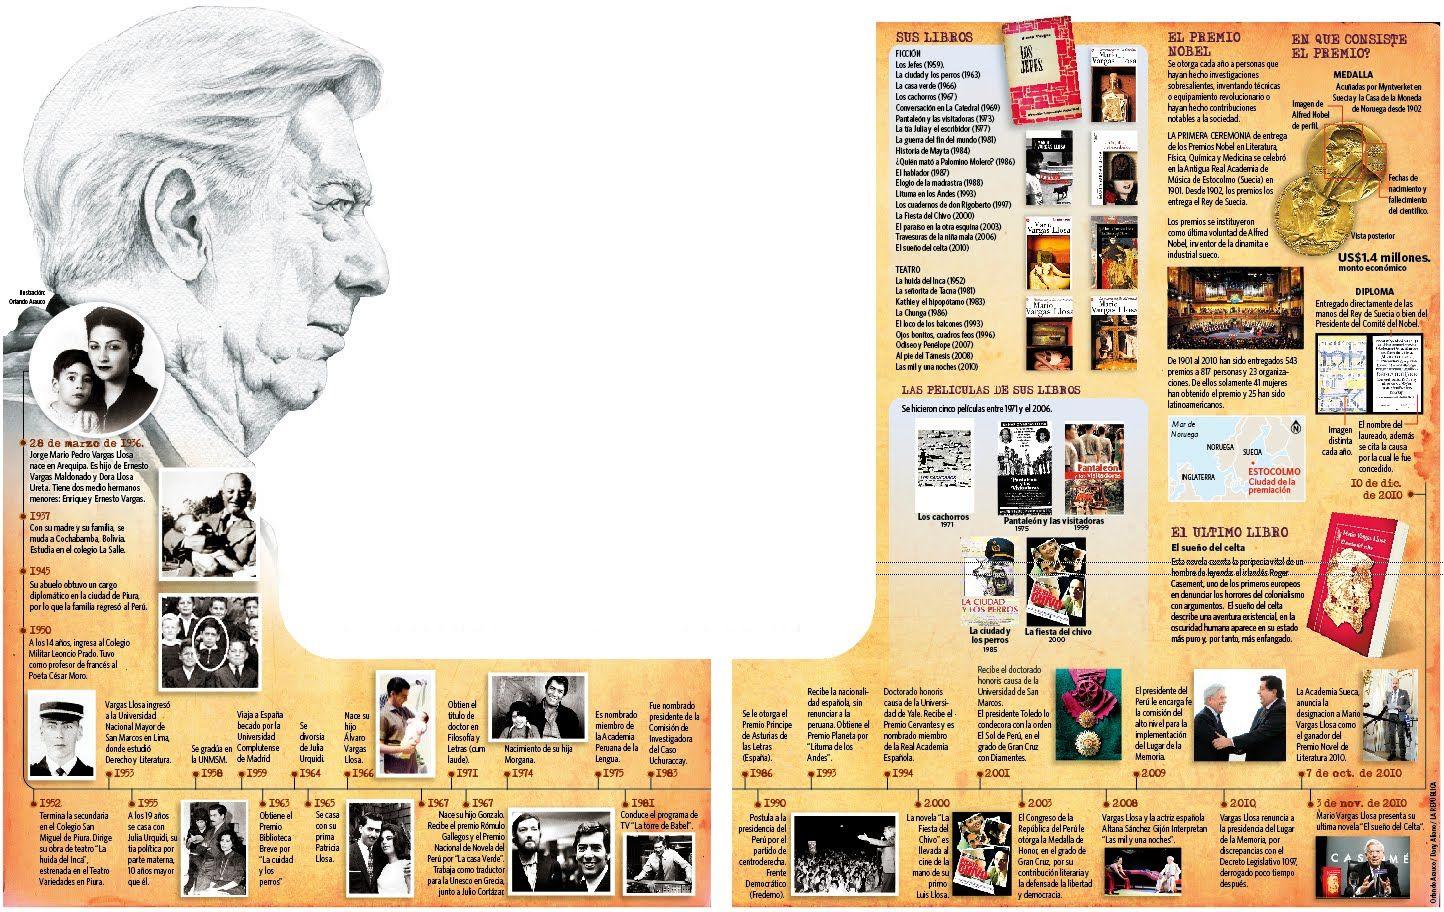 Meet The Extraordinary Mario Vargas Llosa He Is A Writer, Essayist,  Journalist,